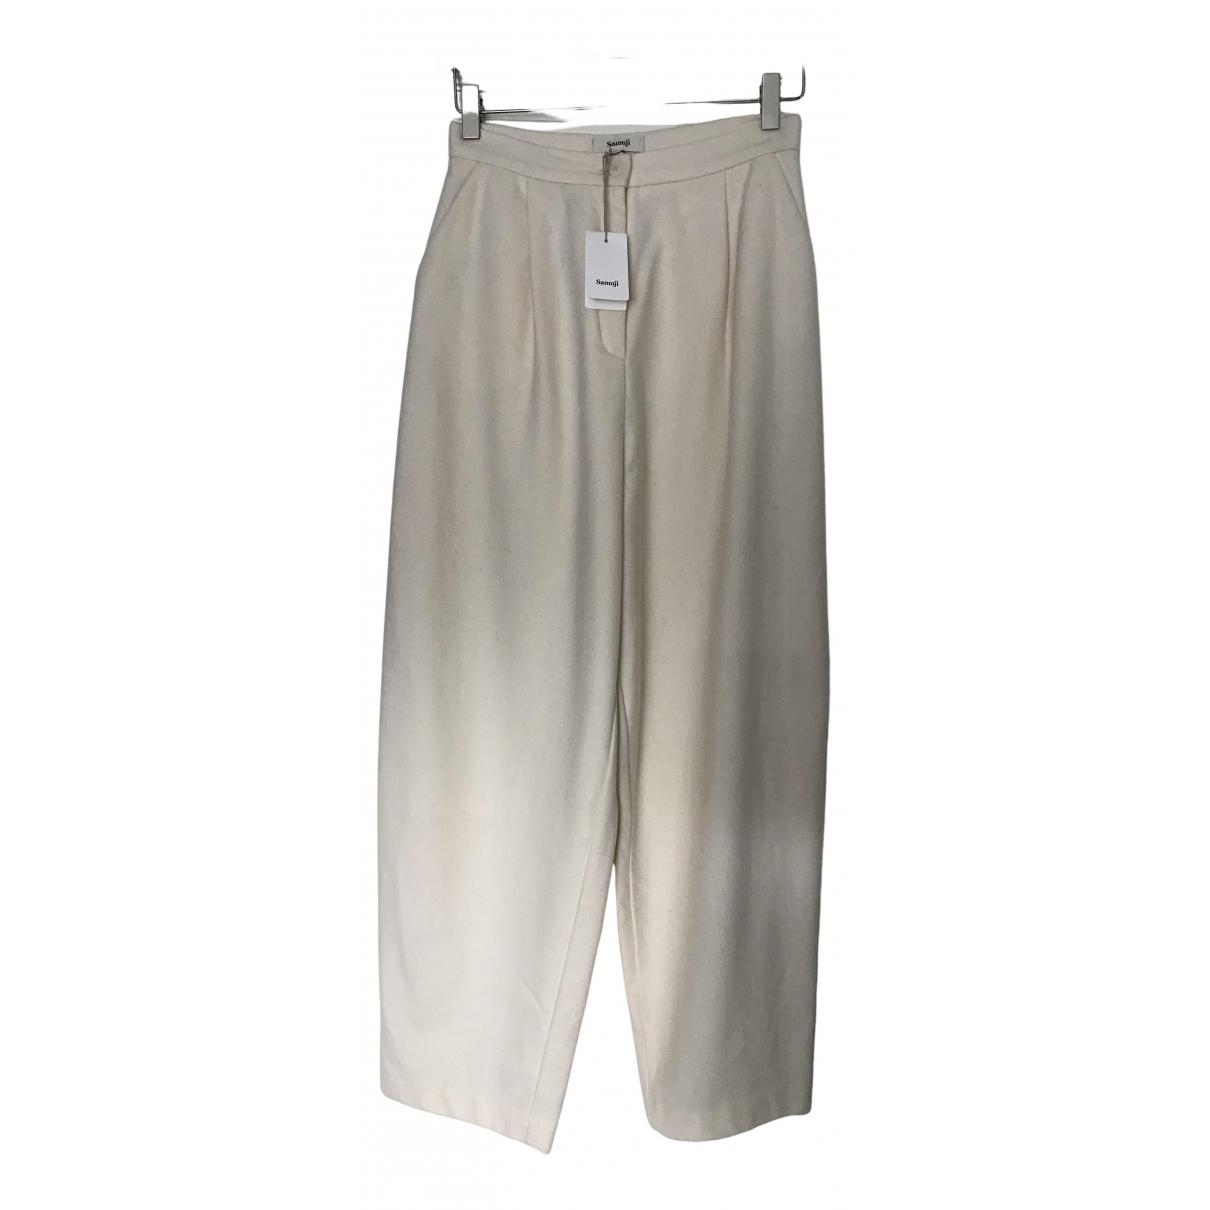 Pantalon zanahoria de Lana Samuji